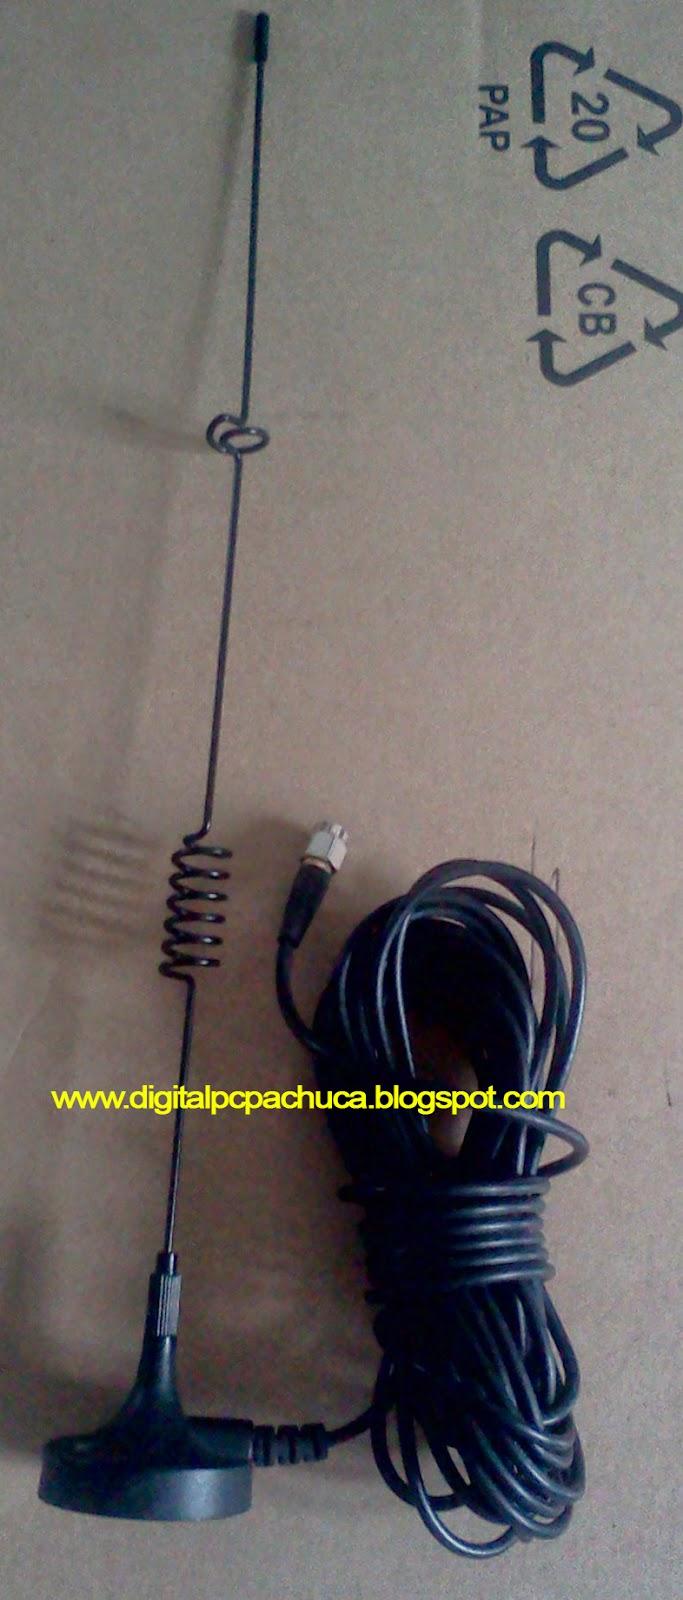 Antena externa gsm gprs para tpv